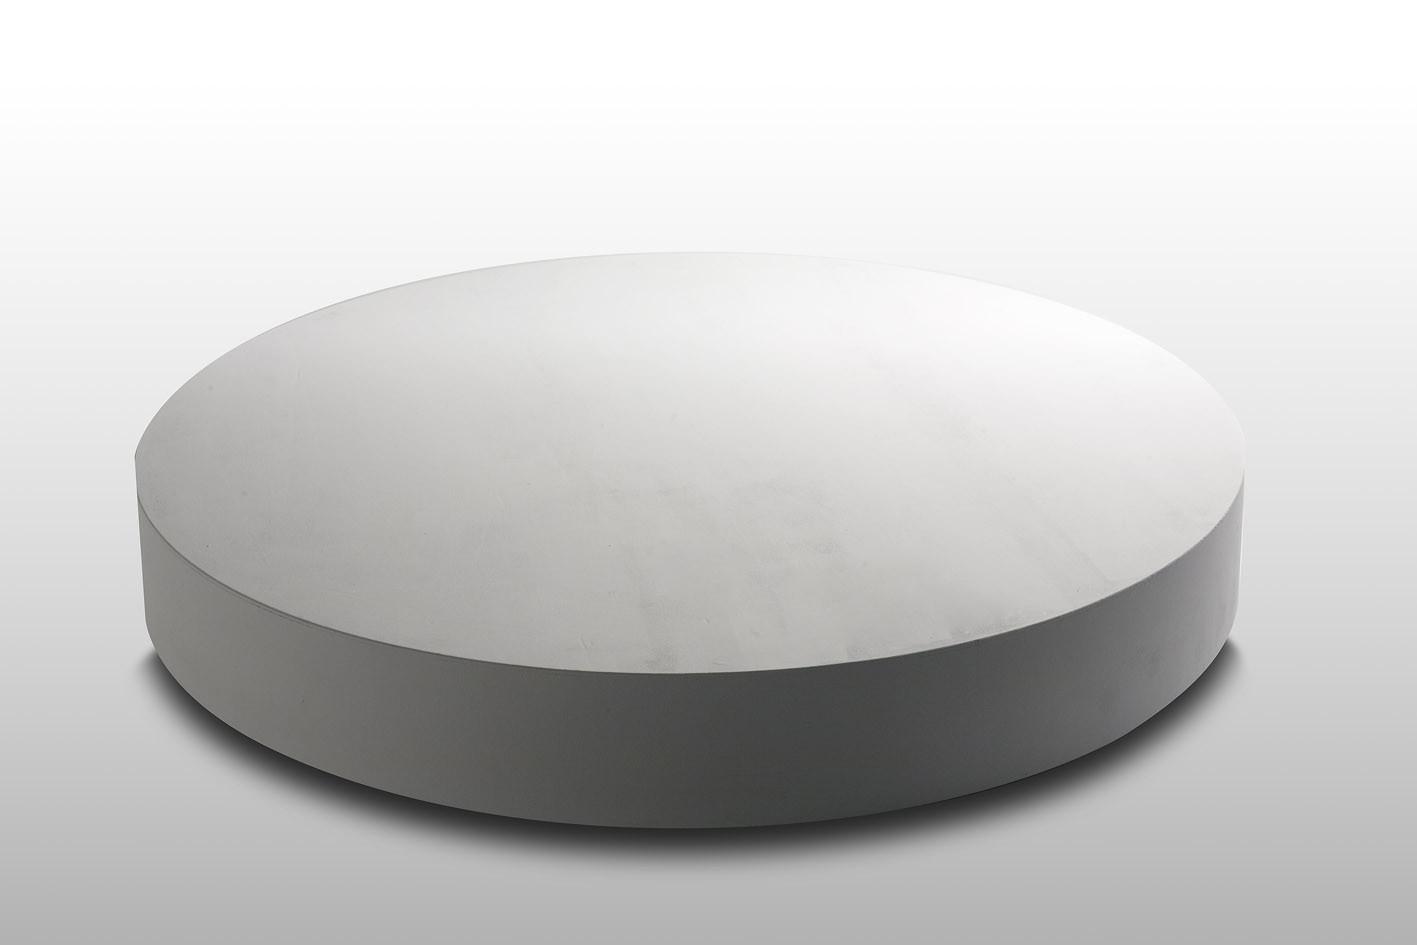 plateau tournant max 100 200 ou 300 kg